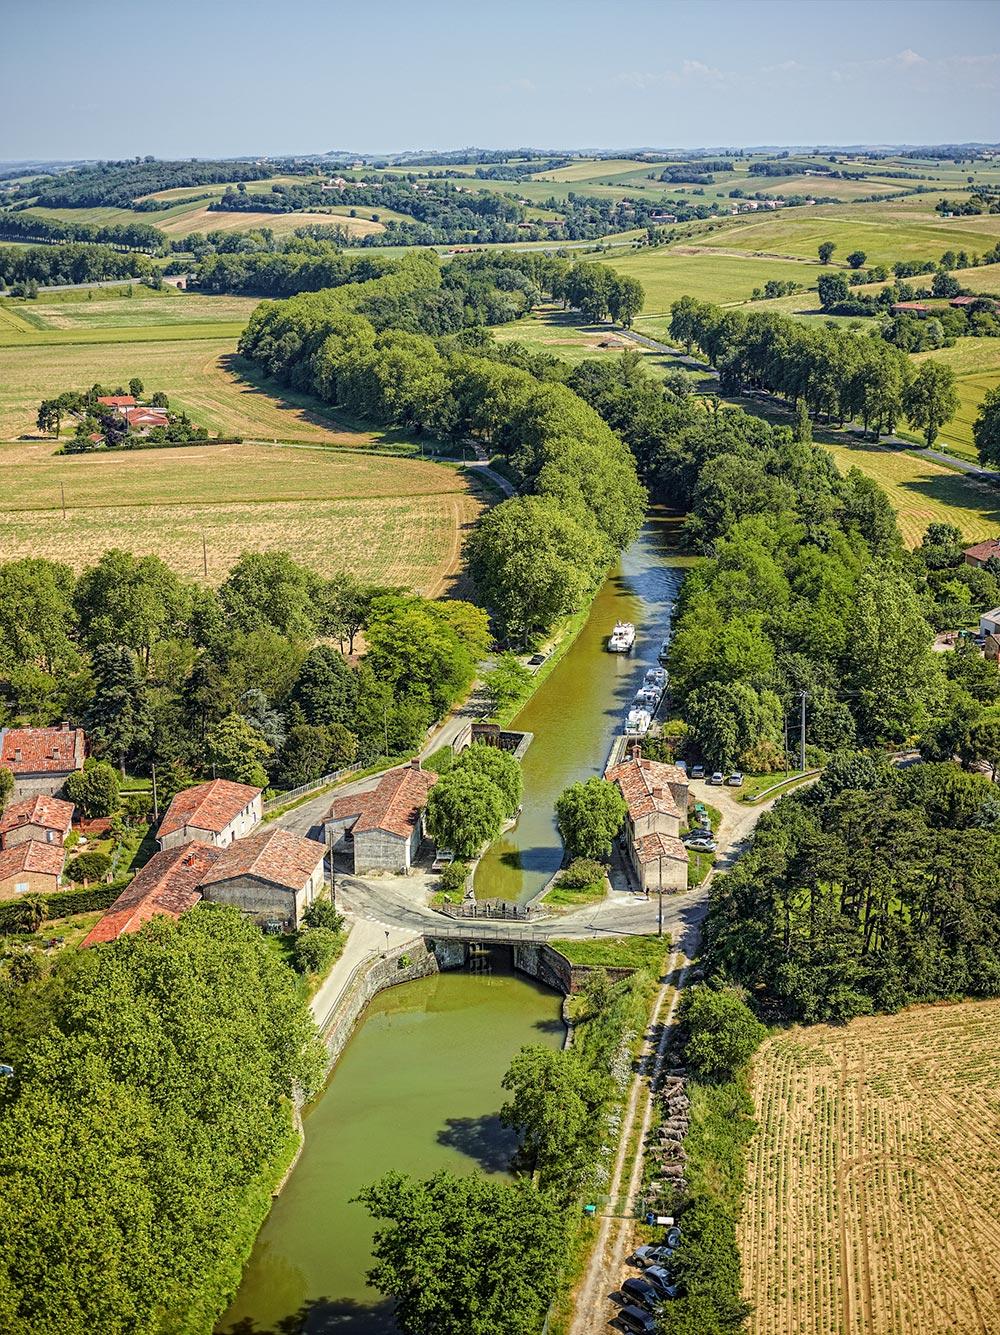 Luftaufnahme des Canal des deux mers in grüner Landschaft